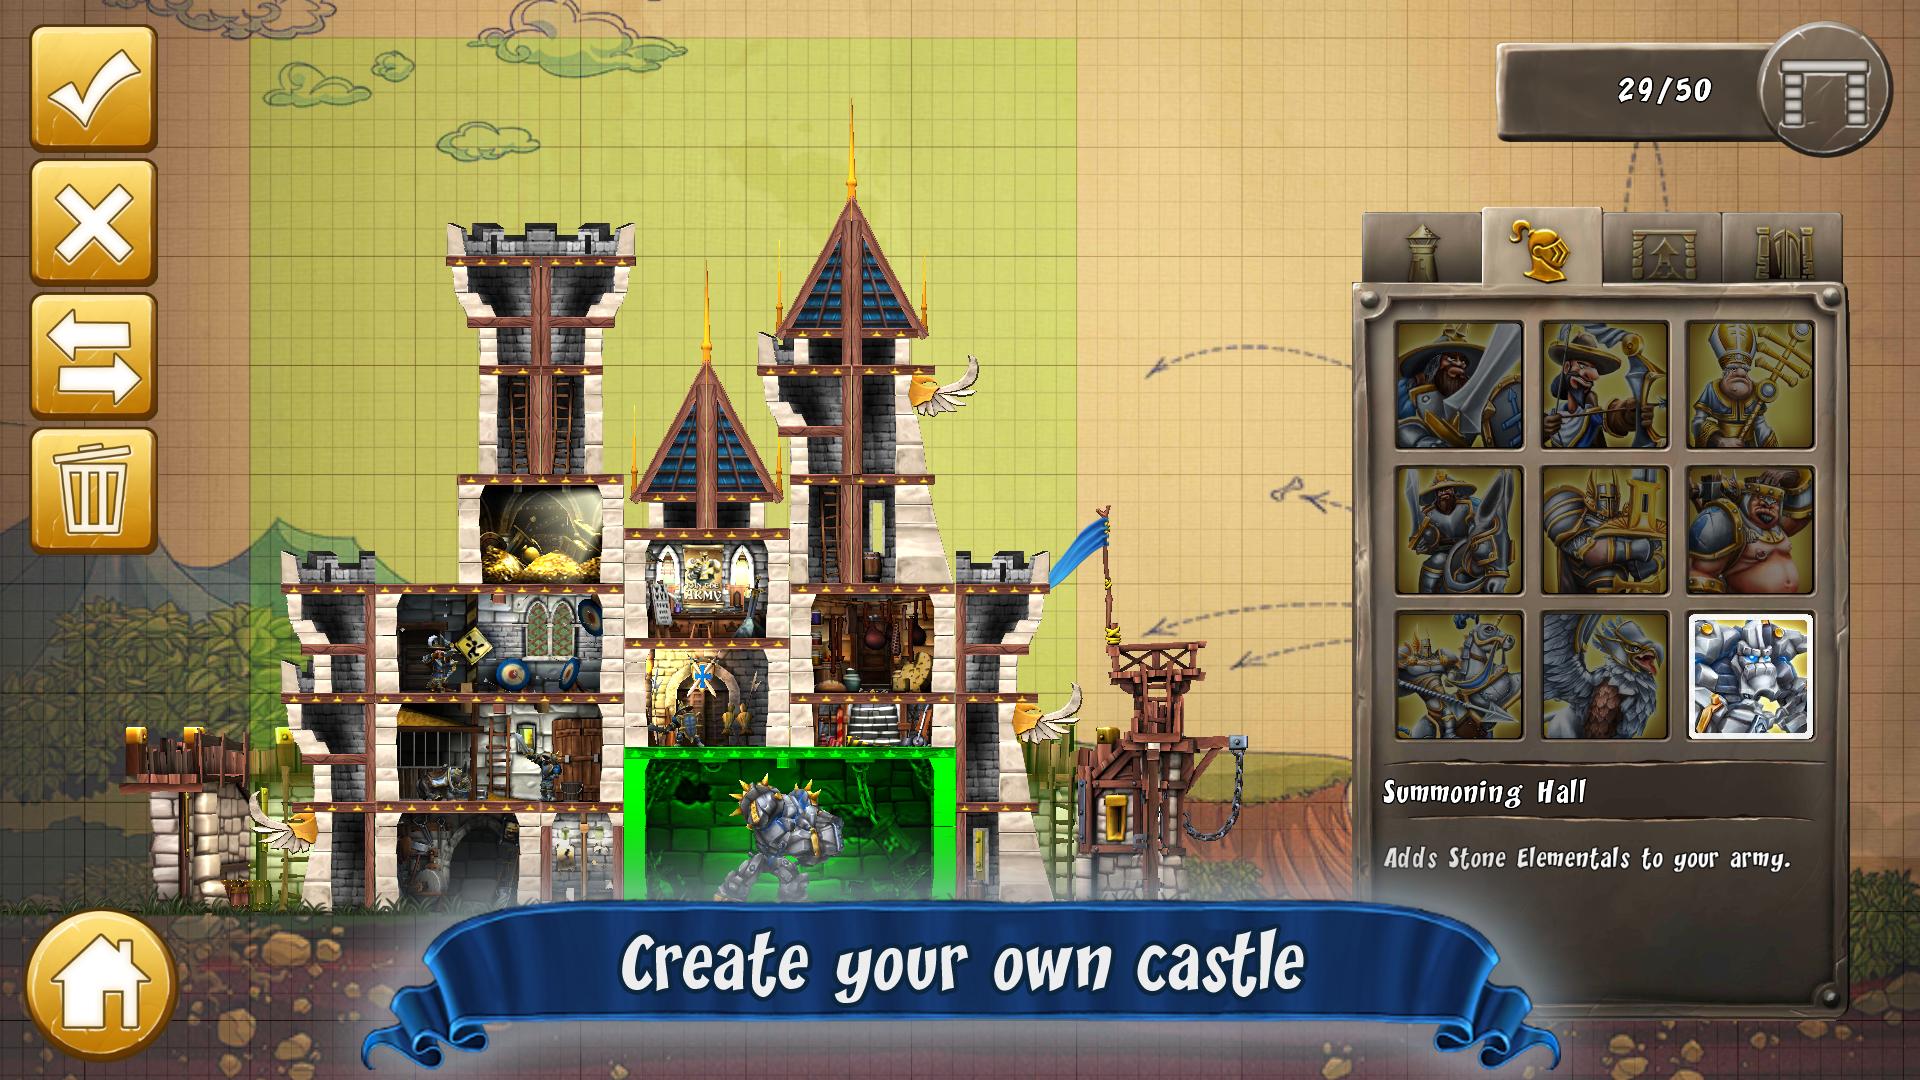 CastleStorm - Free to Siege screenshot #3